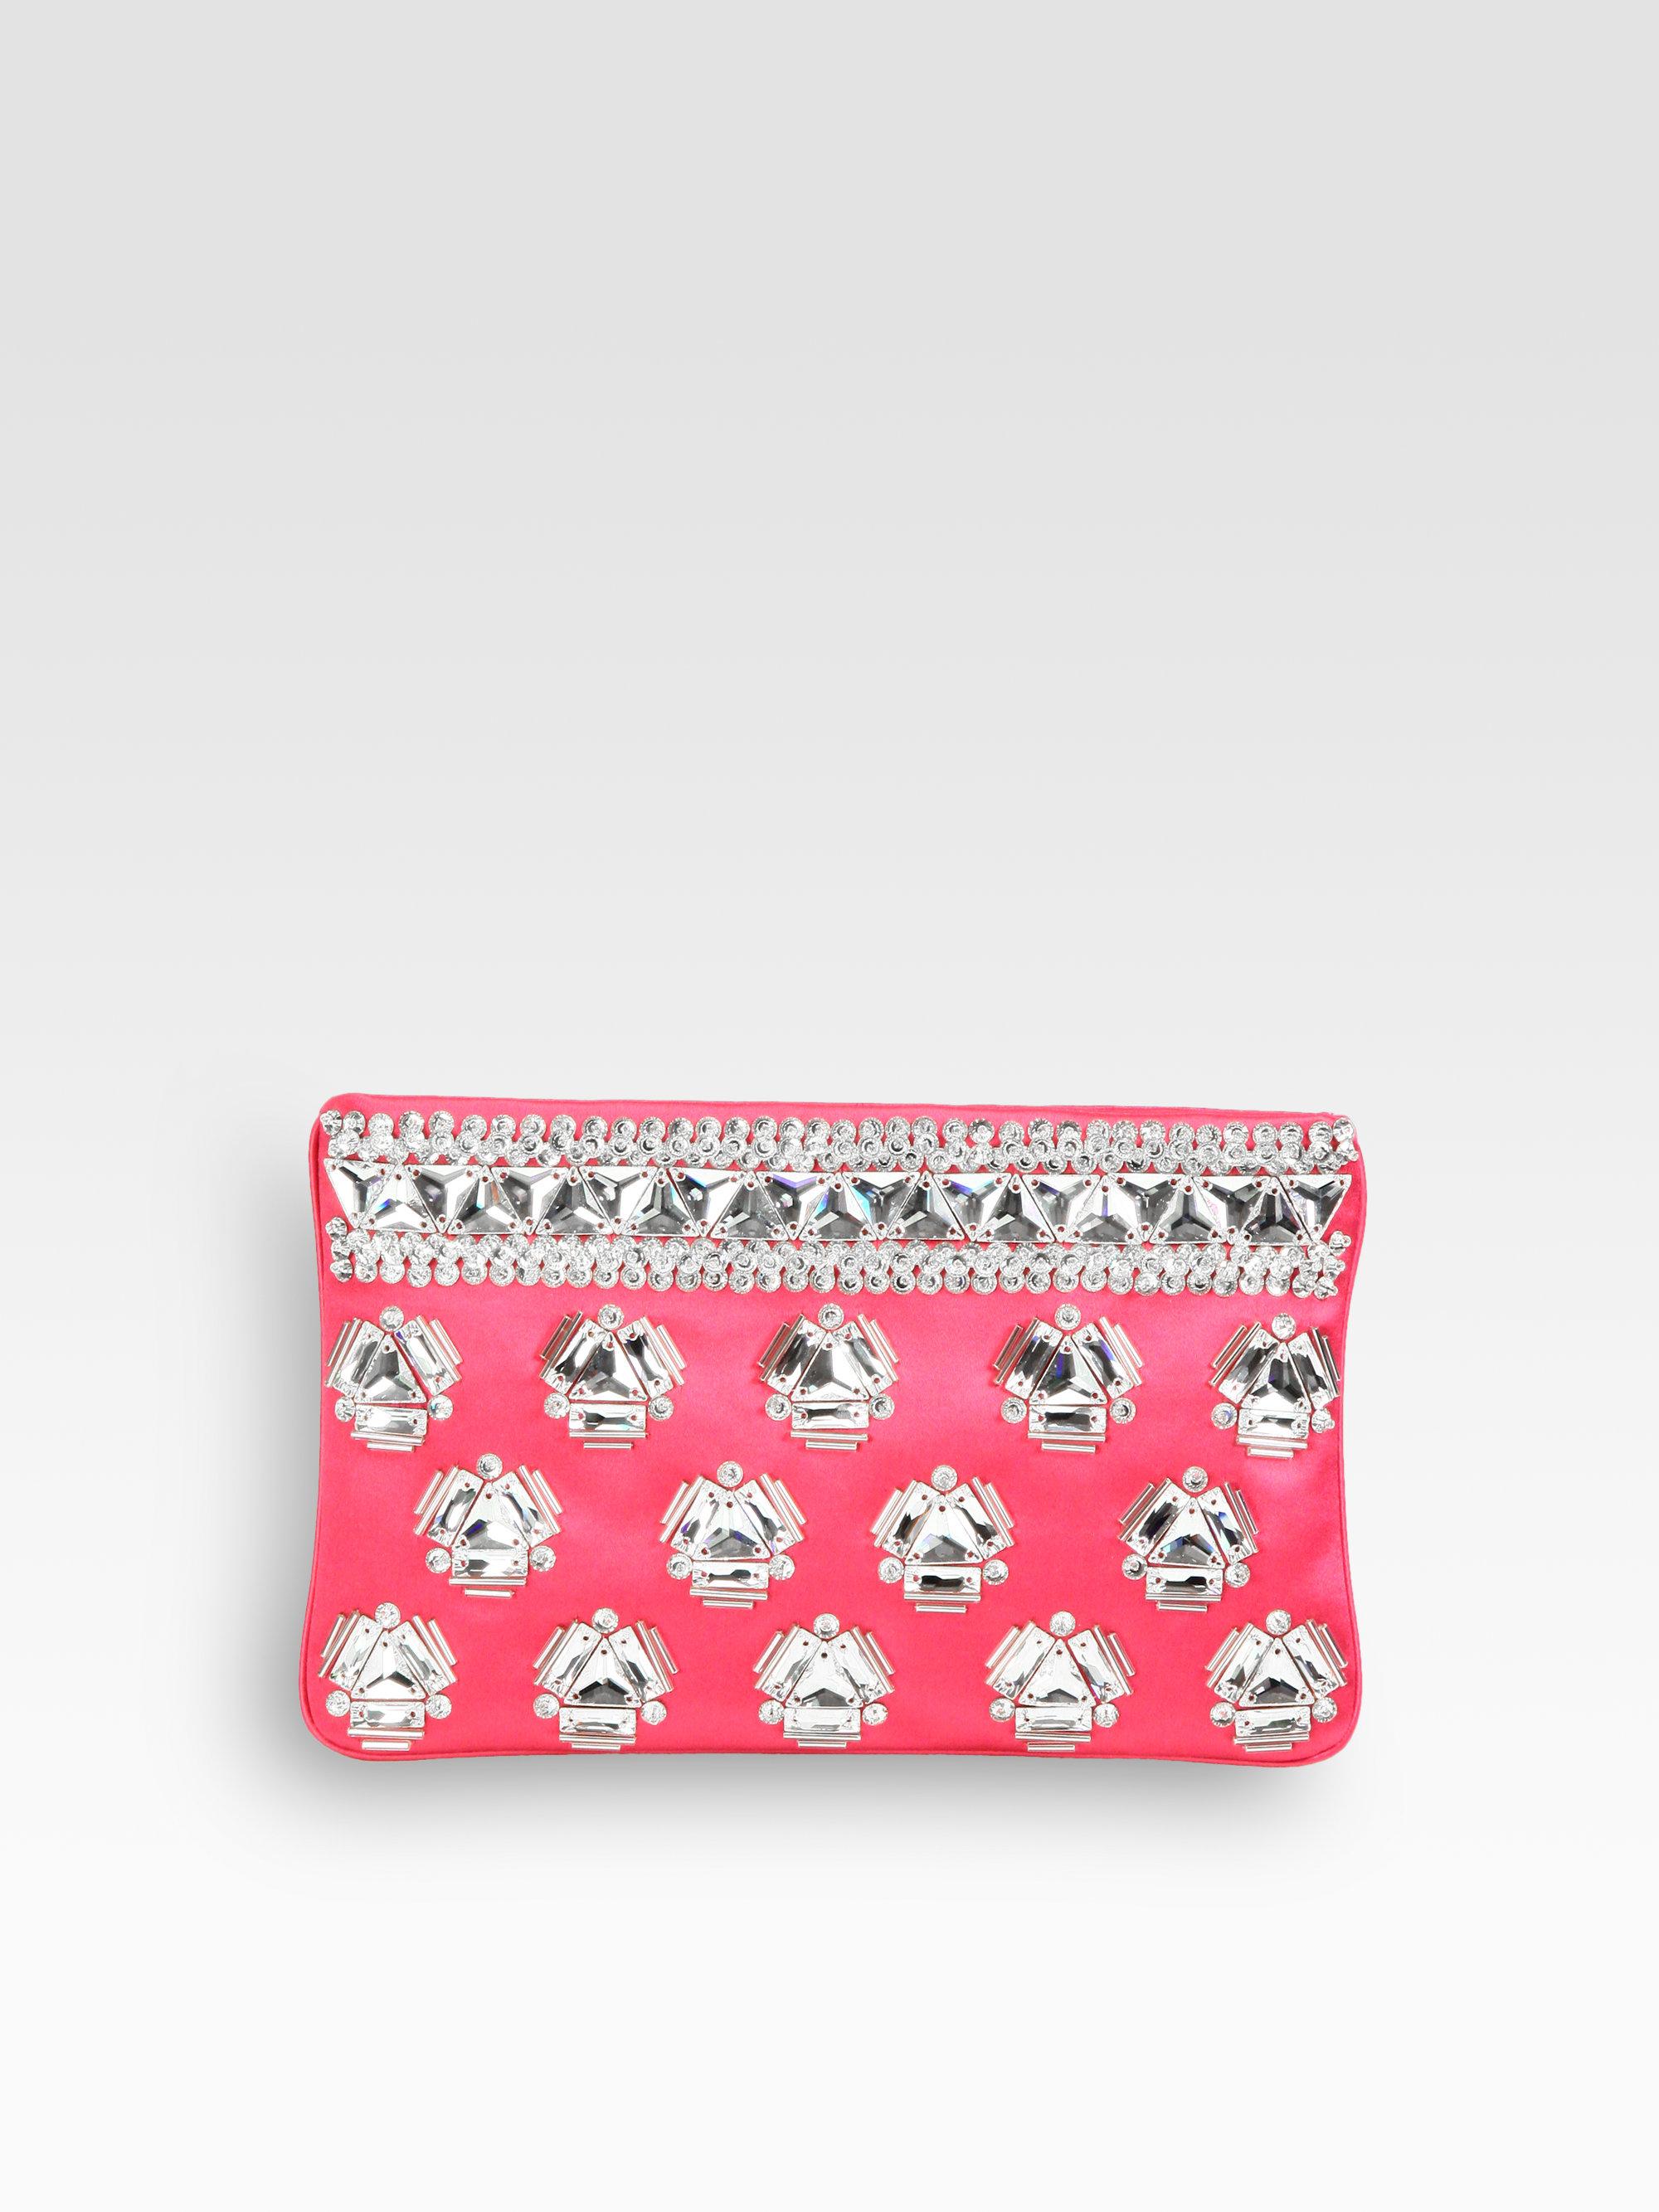 parada purses - Prada Raso Jeweled Satin Clutch in Pink (fuxia-fuchsia) | Lyst